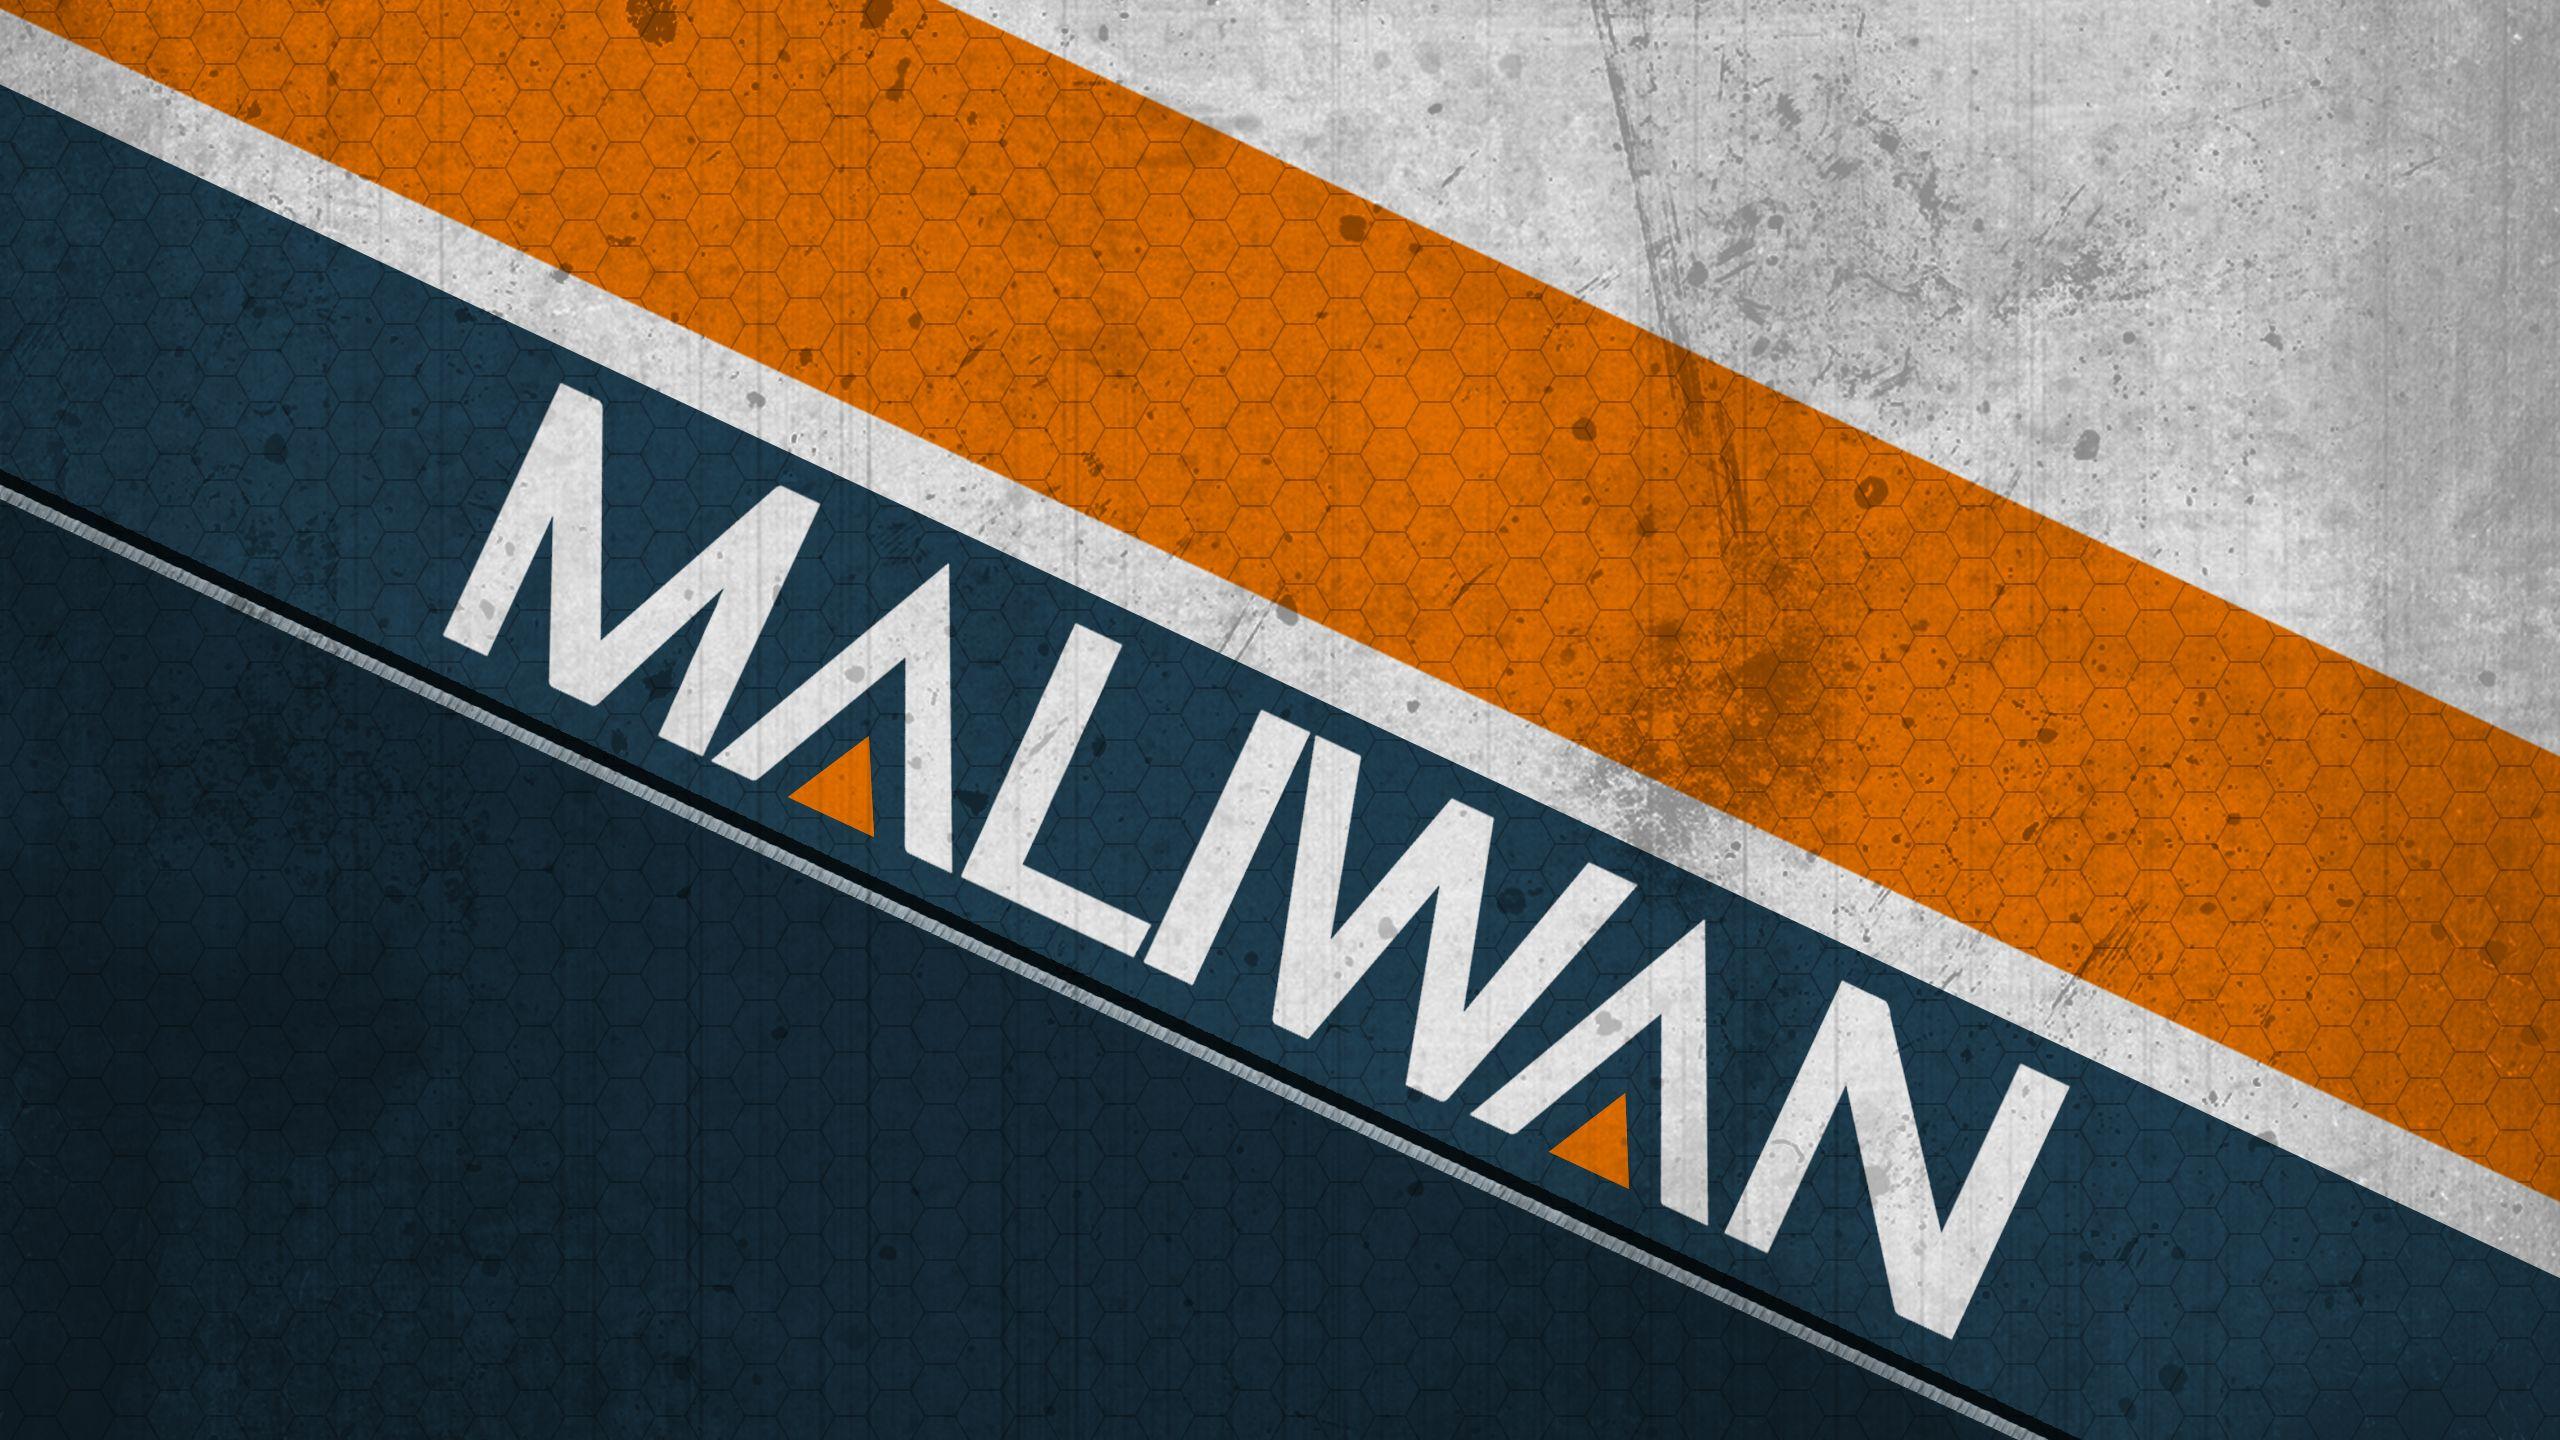 [2560x1440] Maliwan Borderlands via Classy Bro